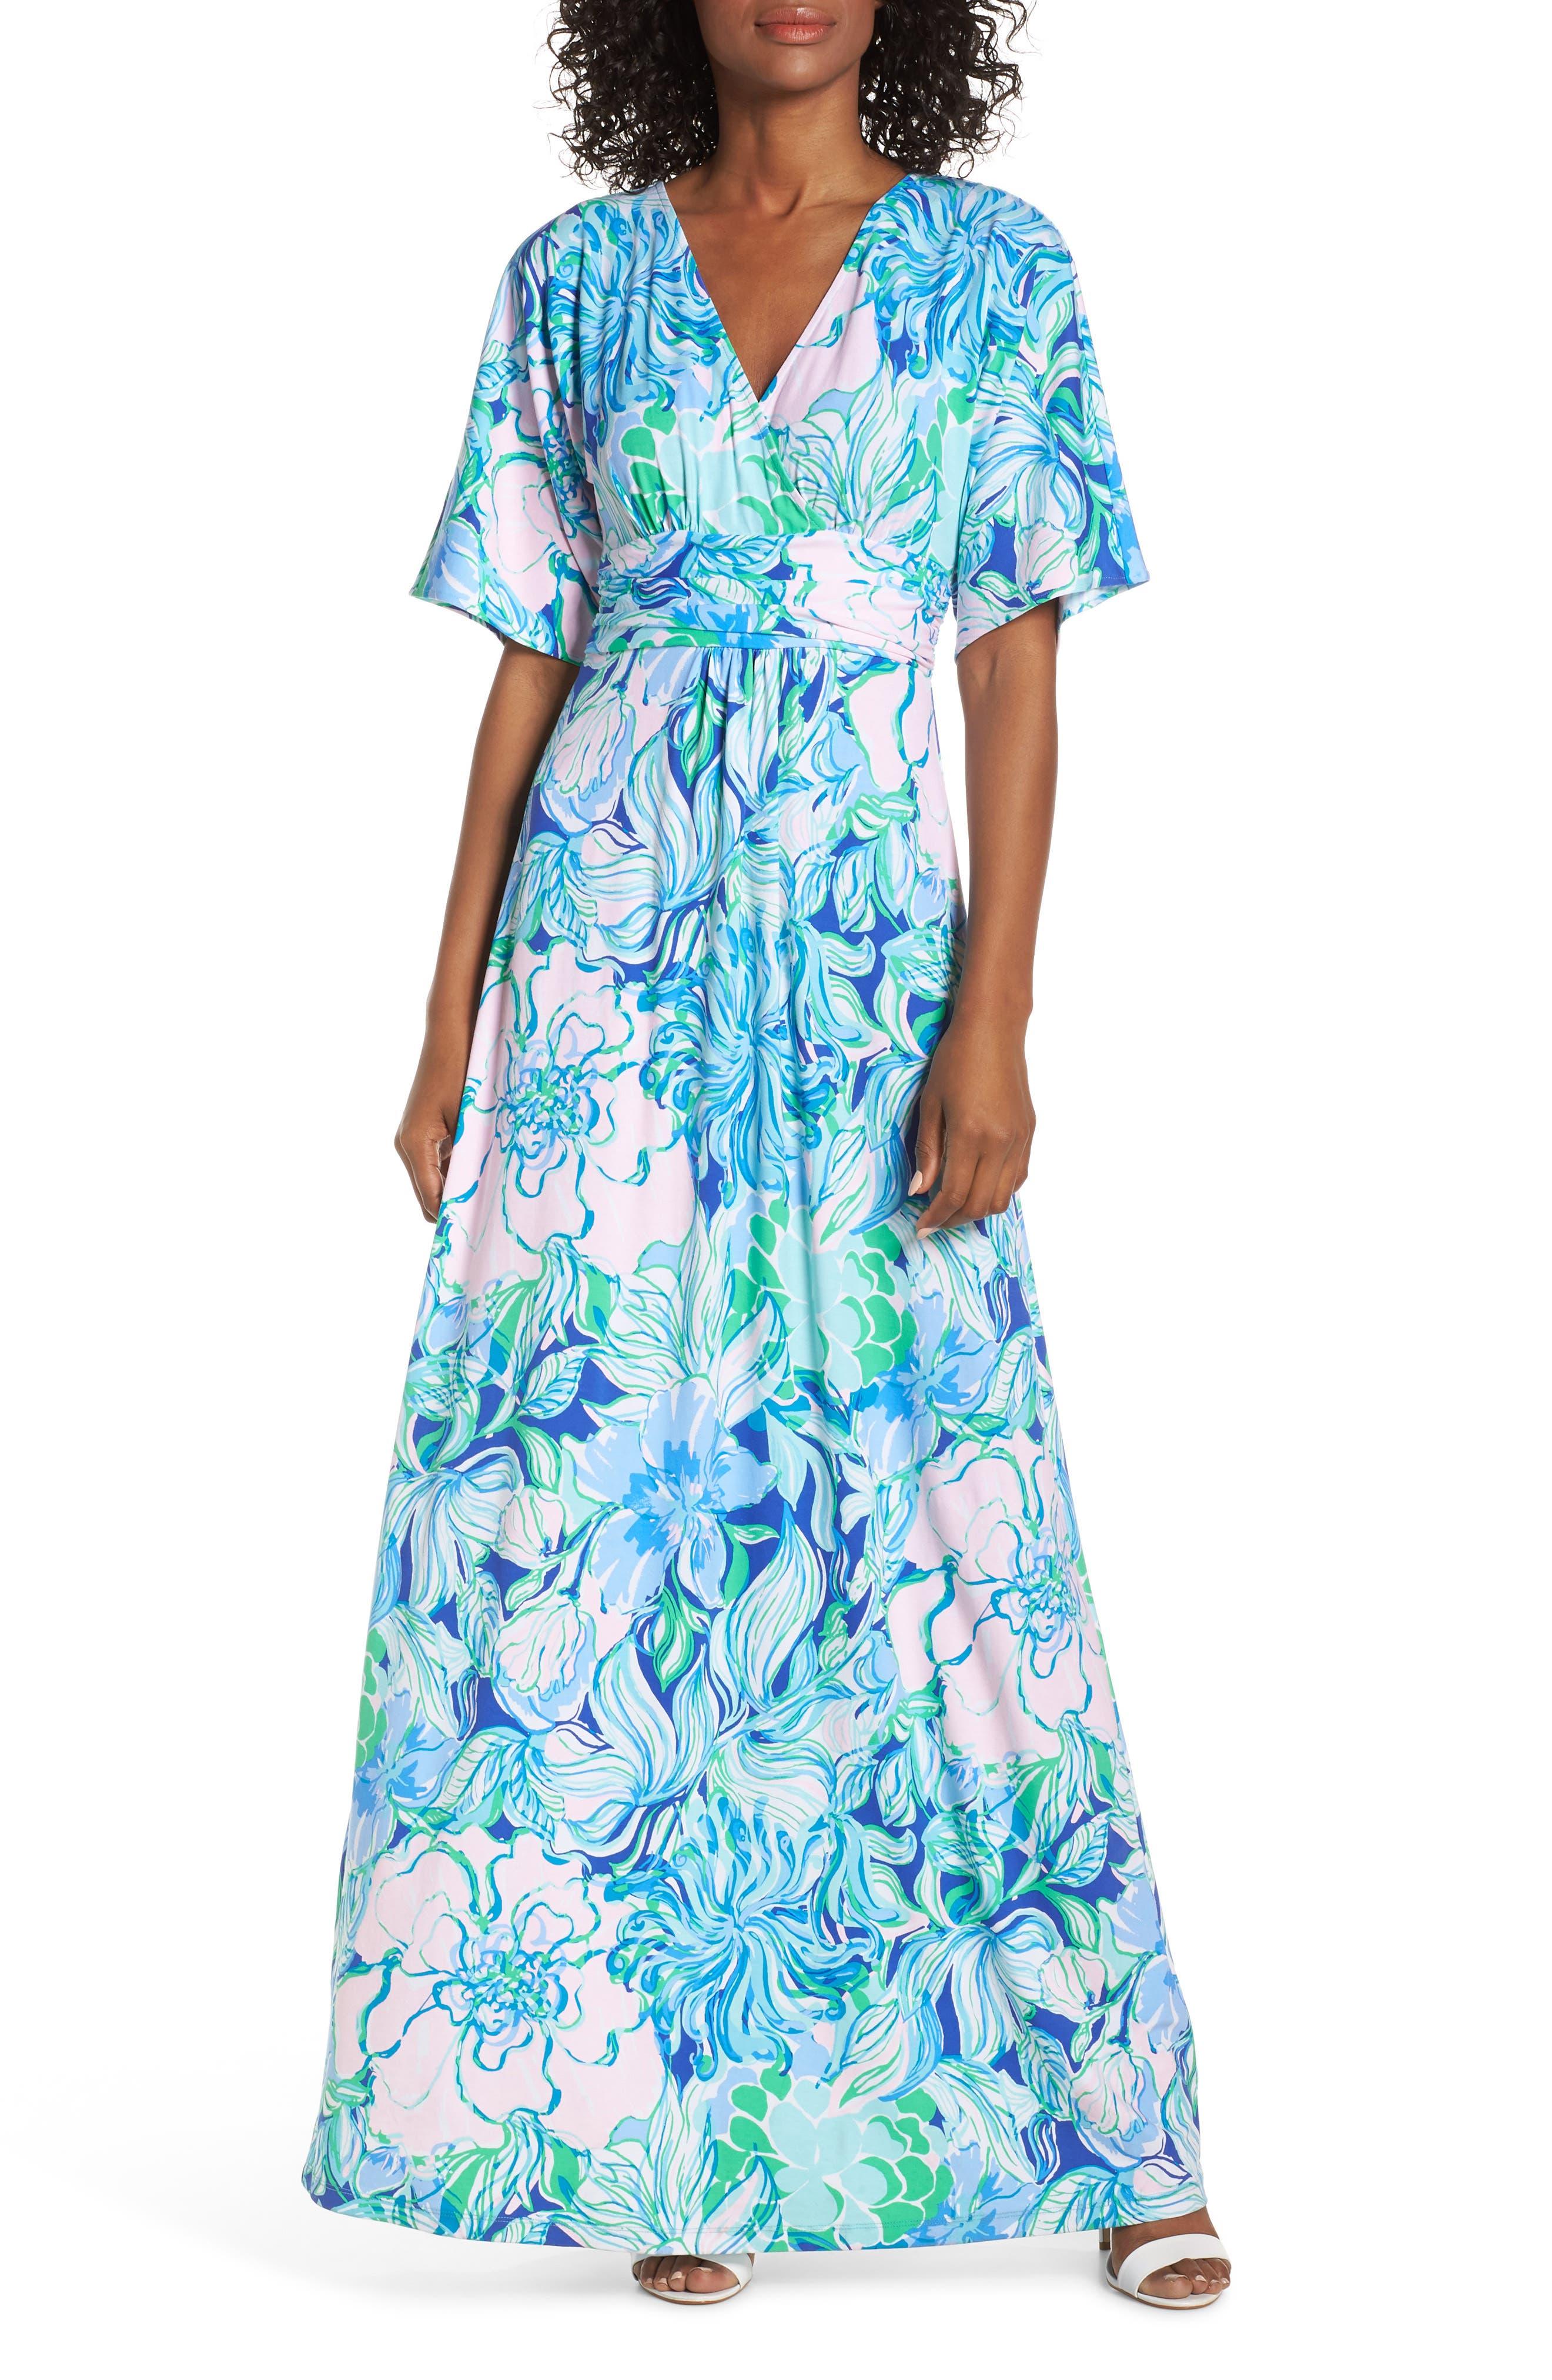 LILLY PULITZER<SUP>®</SUP> Parigi Maxi Dress, Main, color, MULTI PARTY THYME